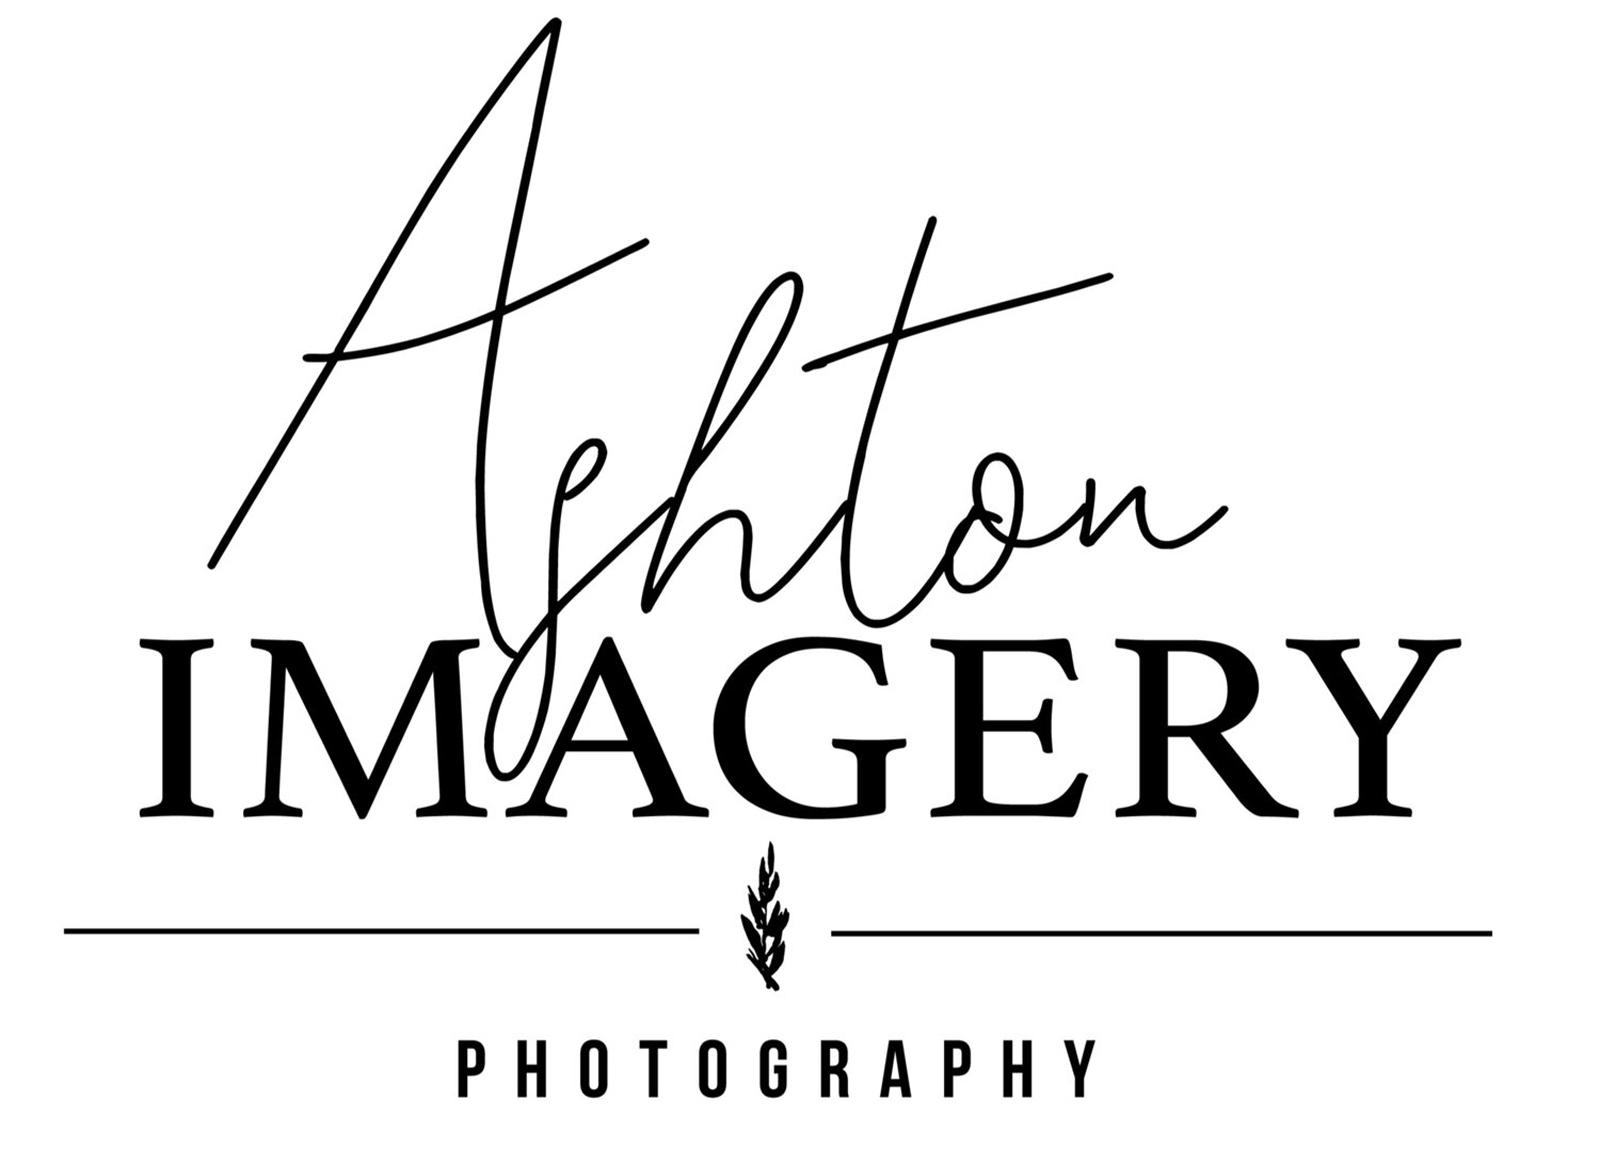 AshtonImagery Photography and Film